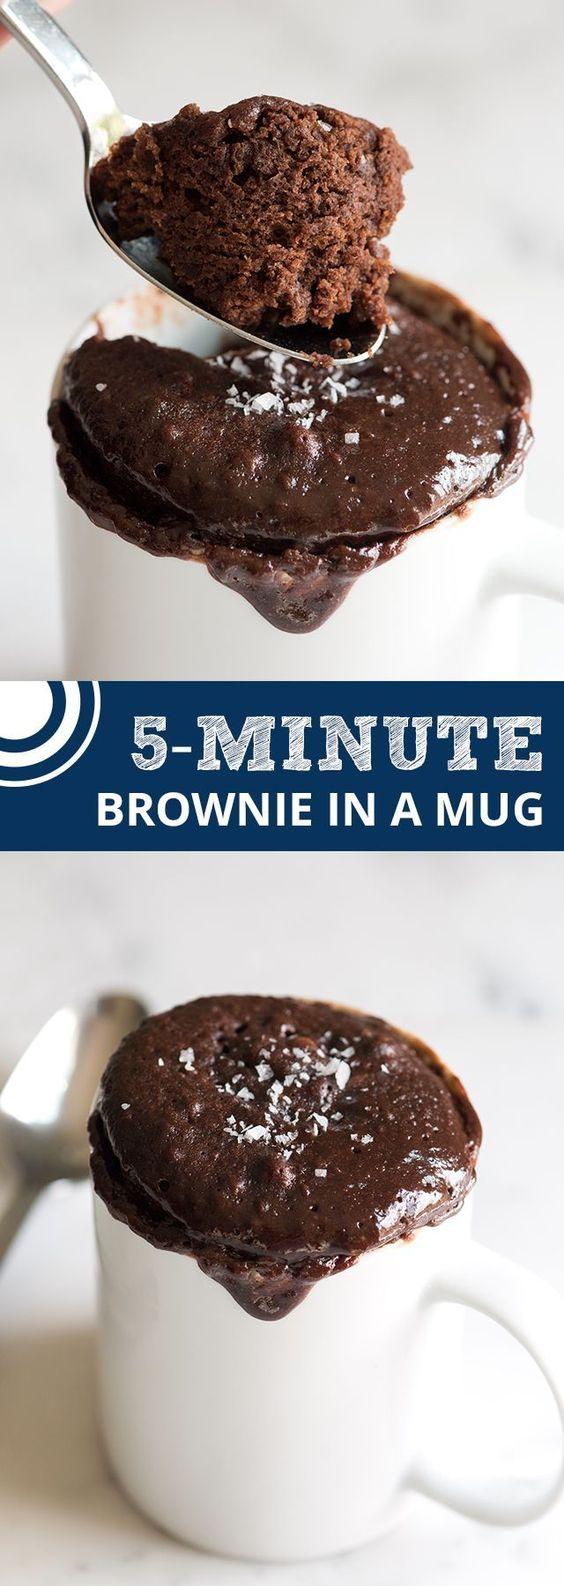 Easy Microwave Brownie in a Mug Recipe